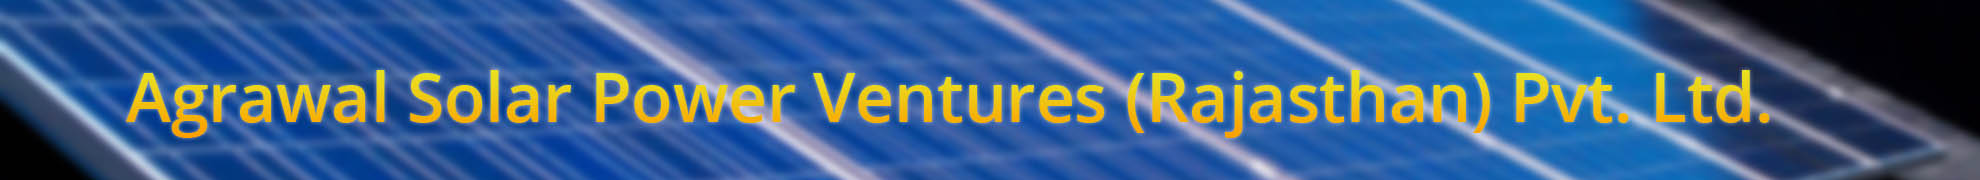 Agrawal Solar Power Ventures (Rajasthan) Pvt. Ltd.